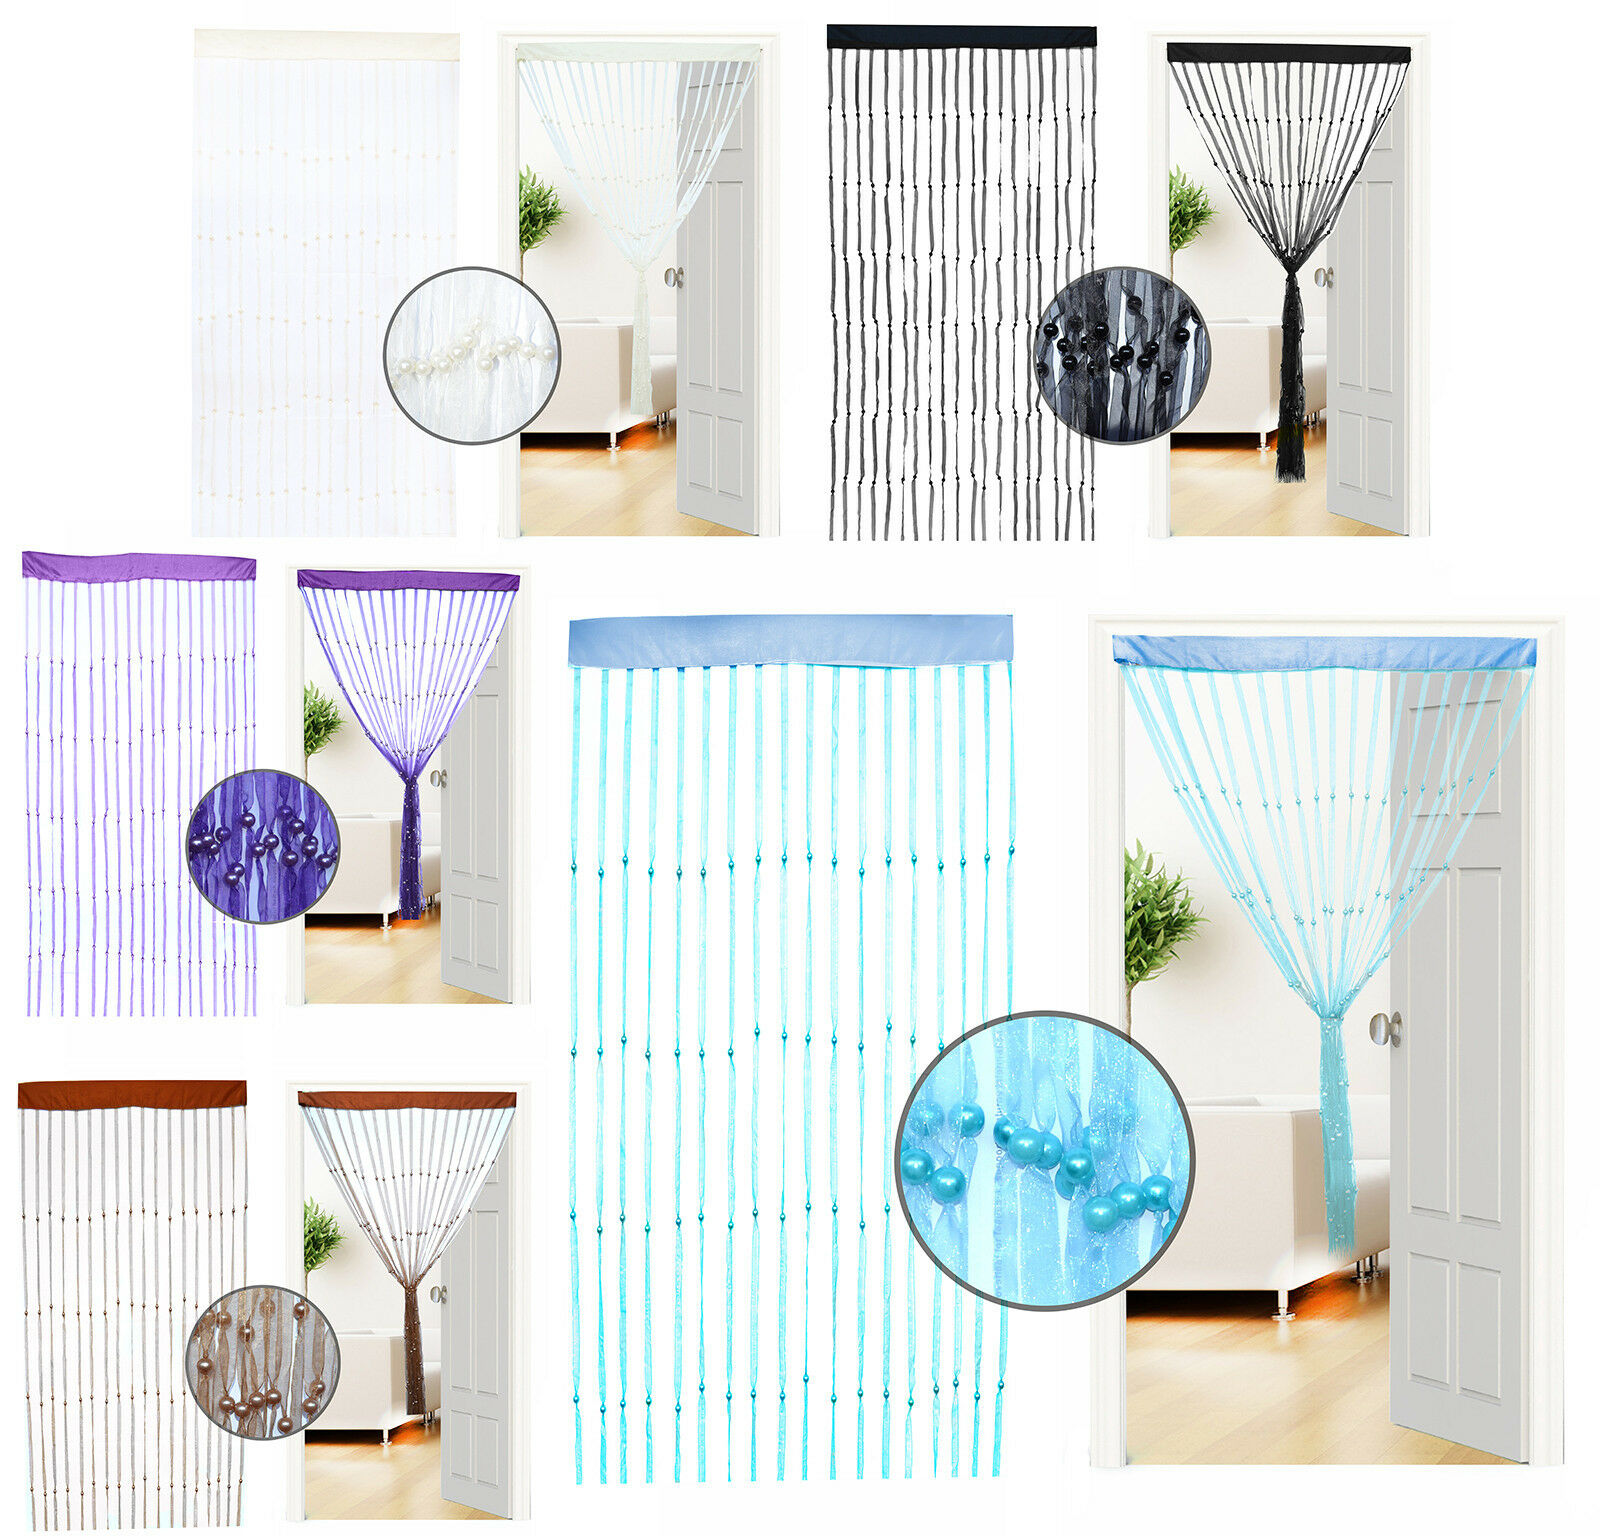 organza schnur vorhang t r wandbehang quaste portiere. Black Bedroom Furniture Sets. Home Design Ideas